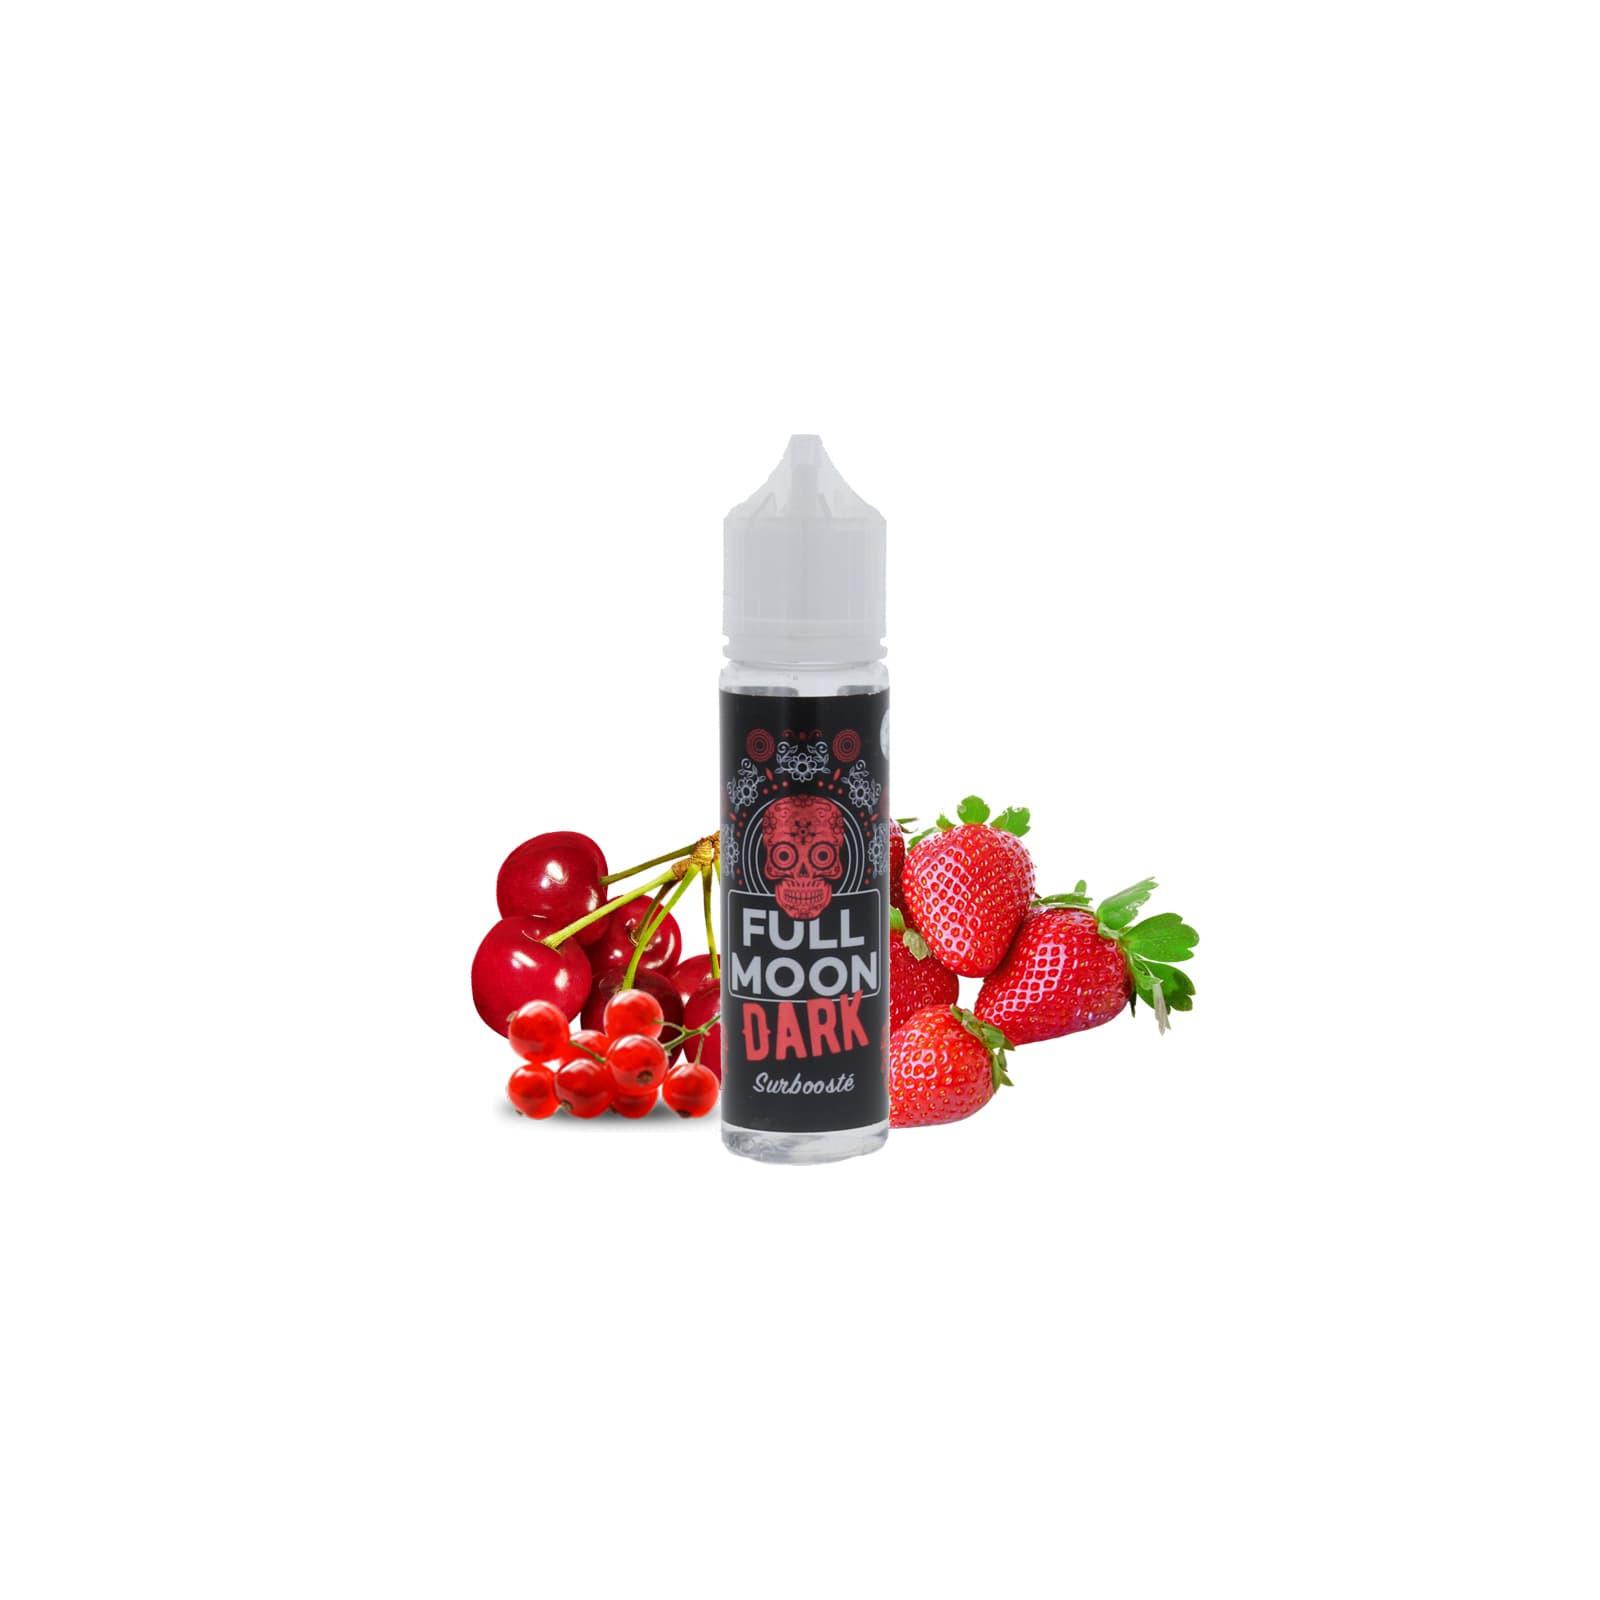 Dark 50ml - Full Moon